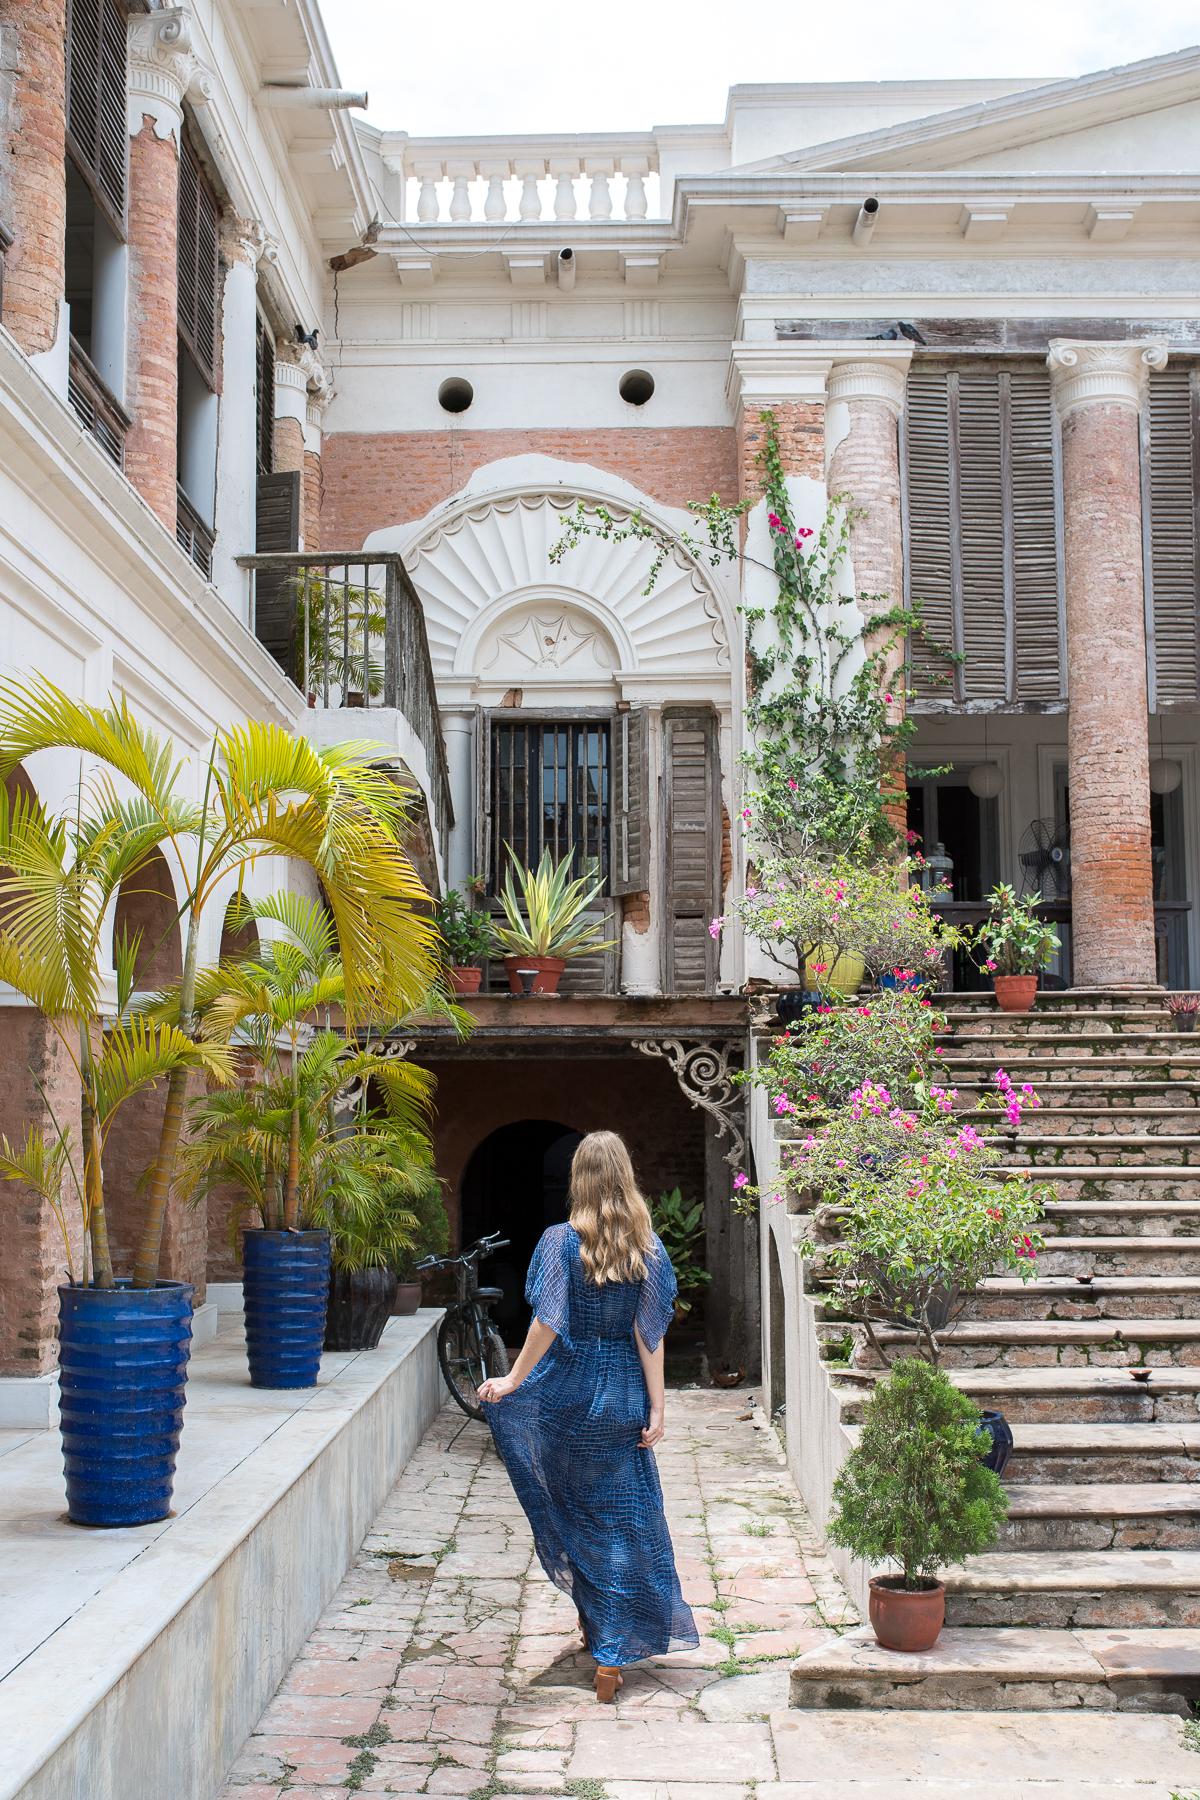 Stacie Flinner The Rajbari Bawali Heritage Hotel Calcutta-37.jpg